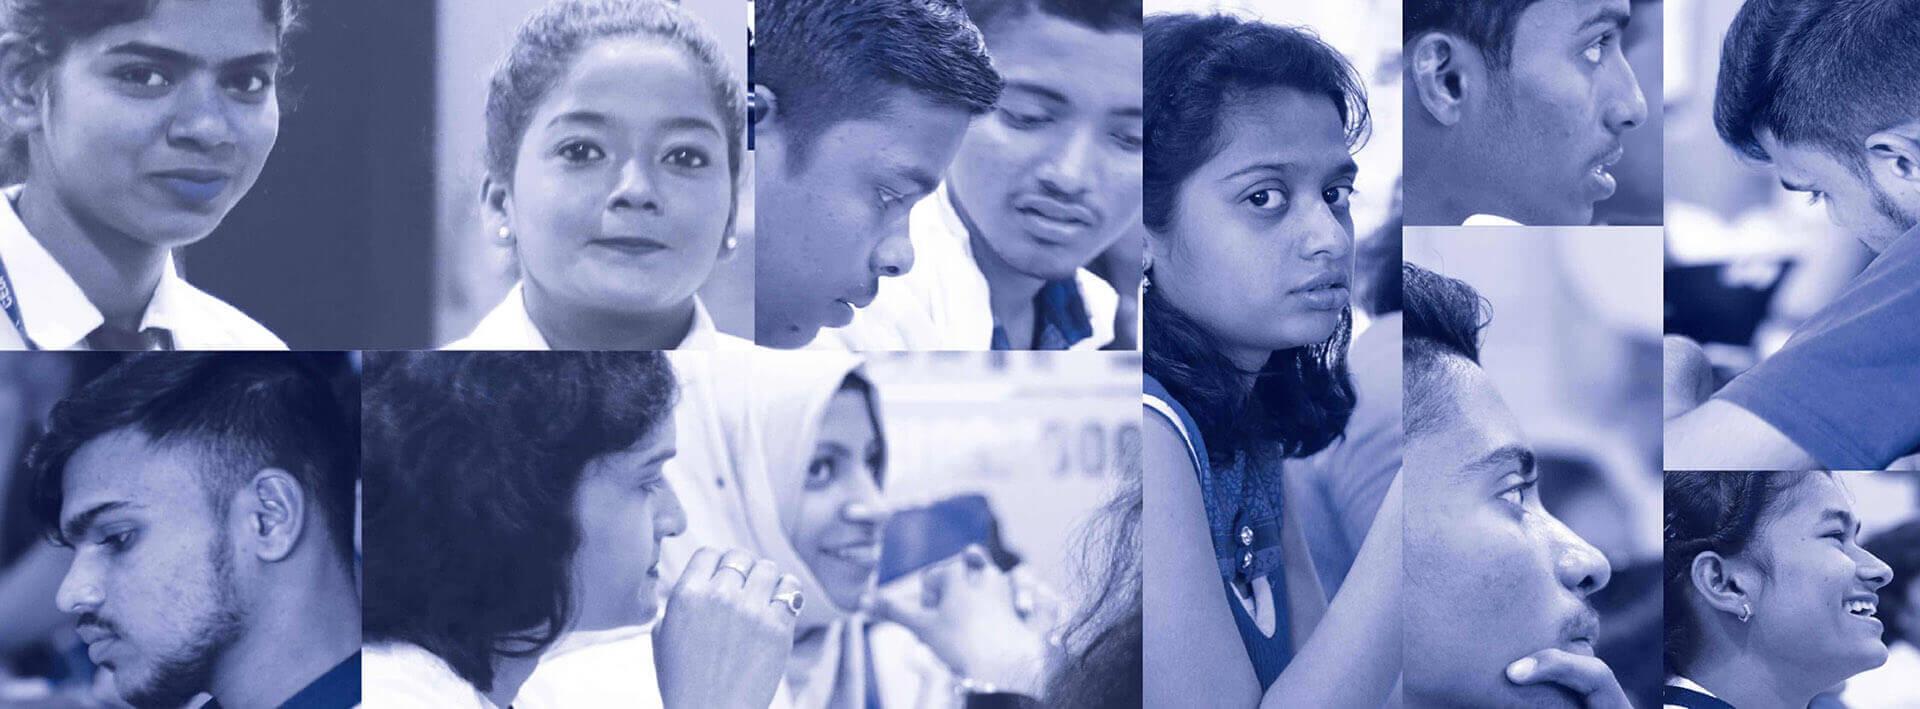 Student Testimonial CEDP Skill Institute